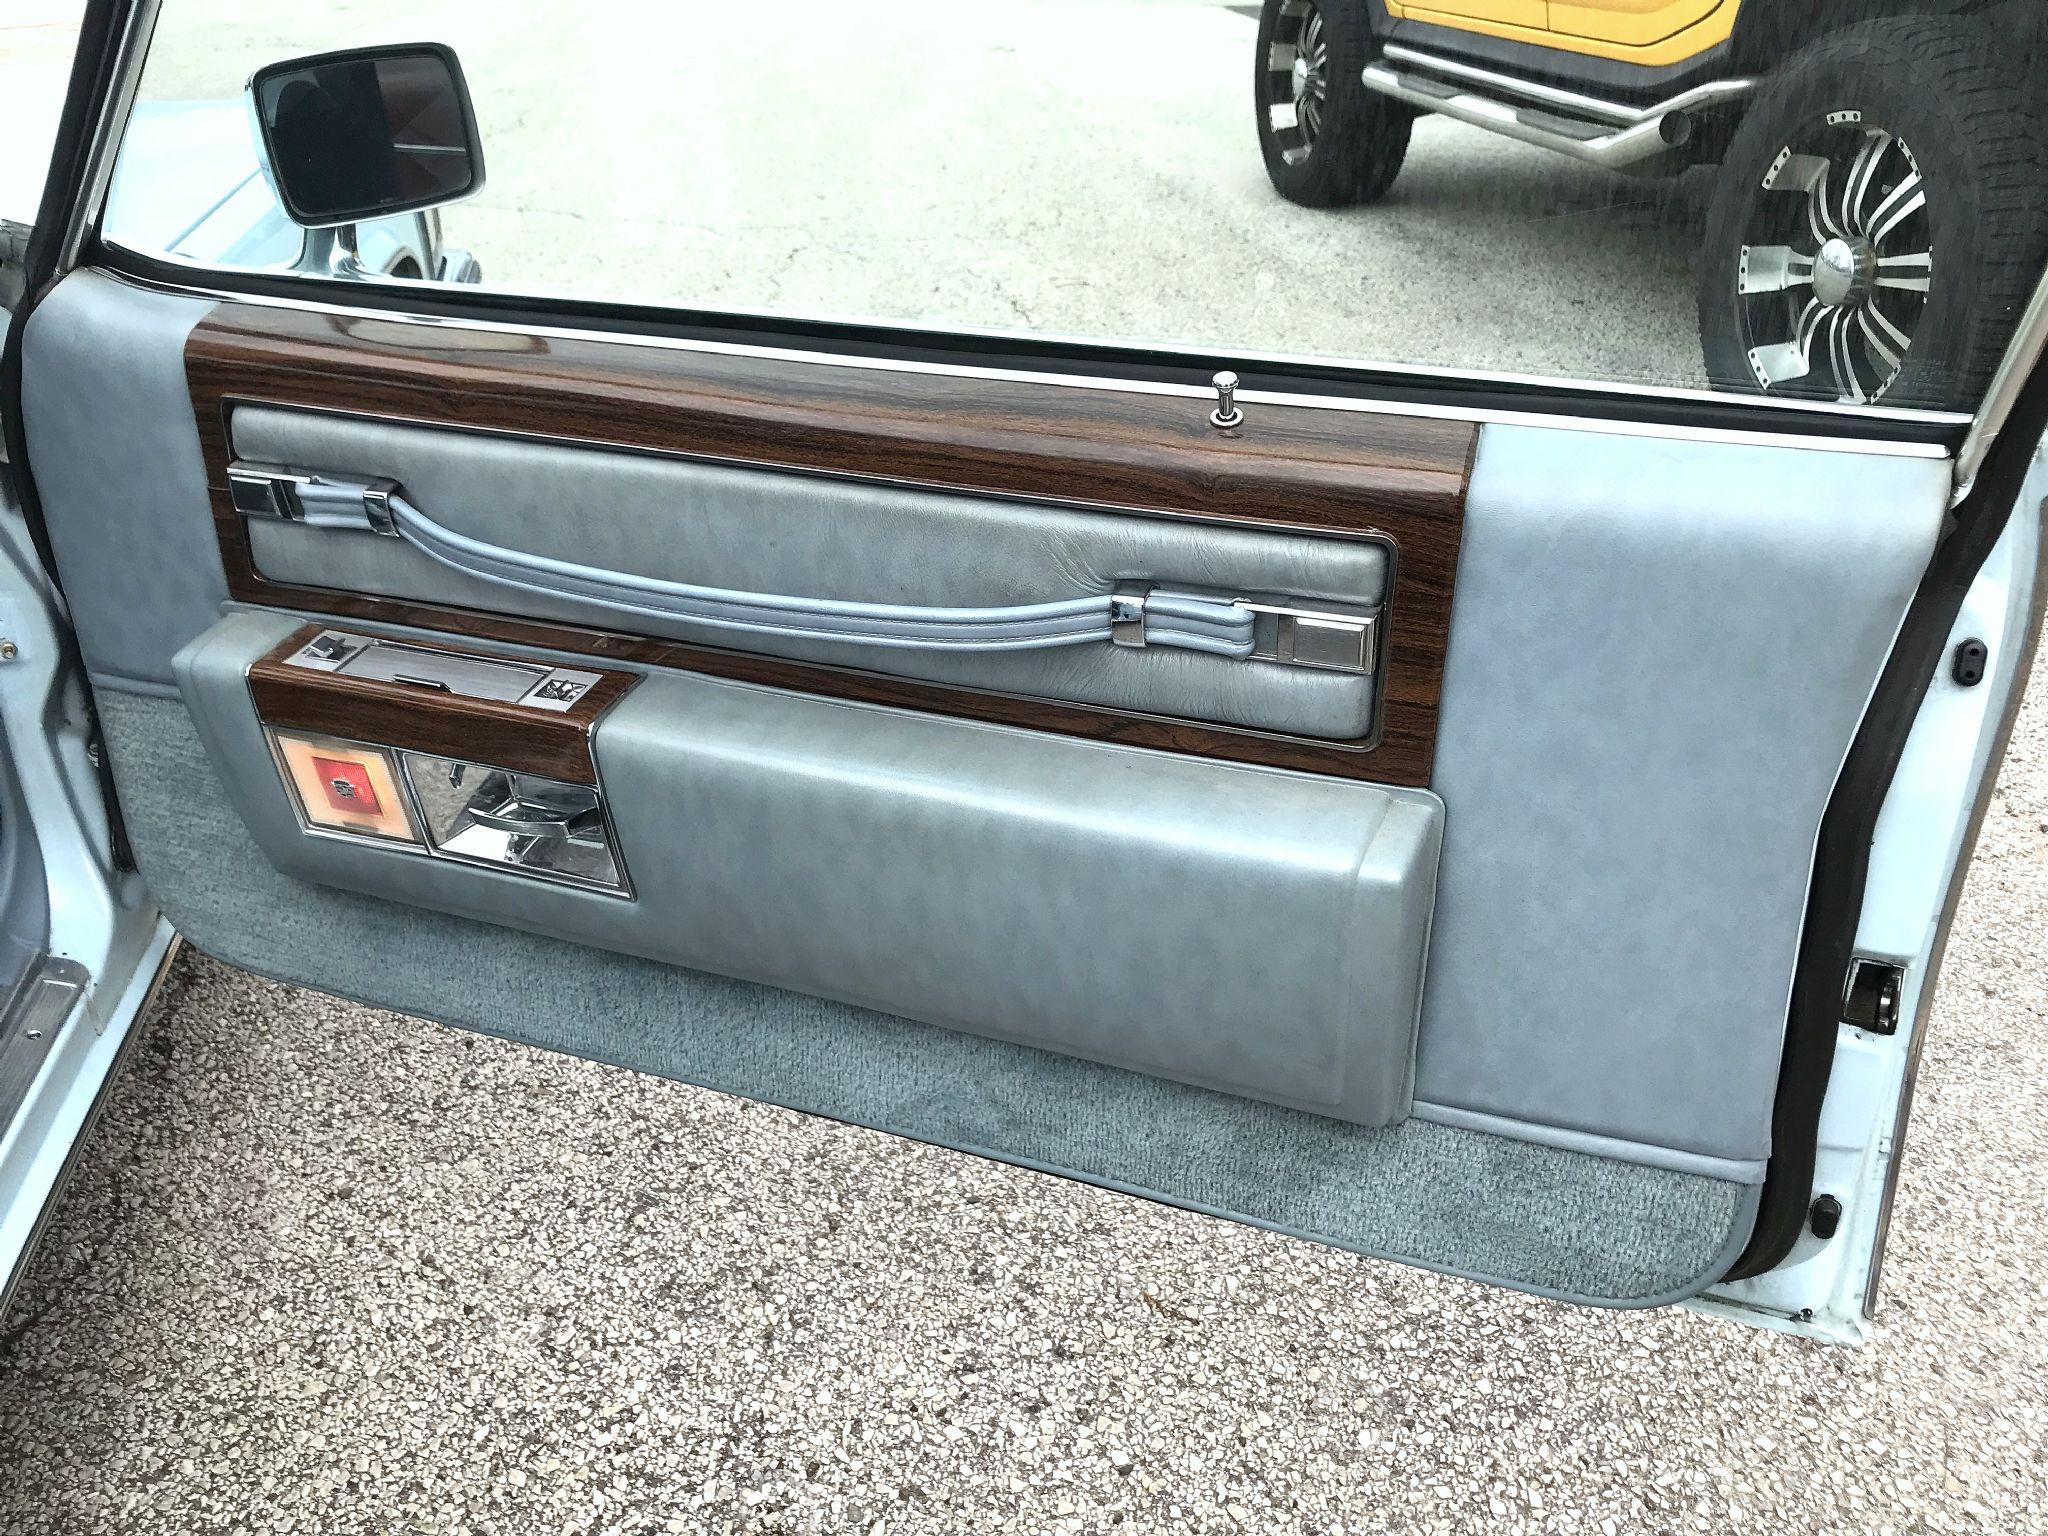 1978 Cadillac Coupe Deville Custom Half Top For Sale All Collector Sedan 4 Door 33